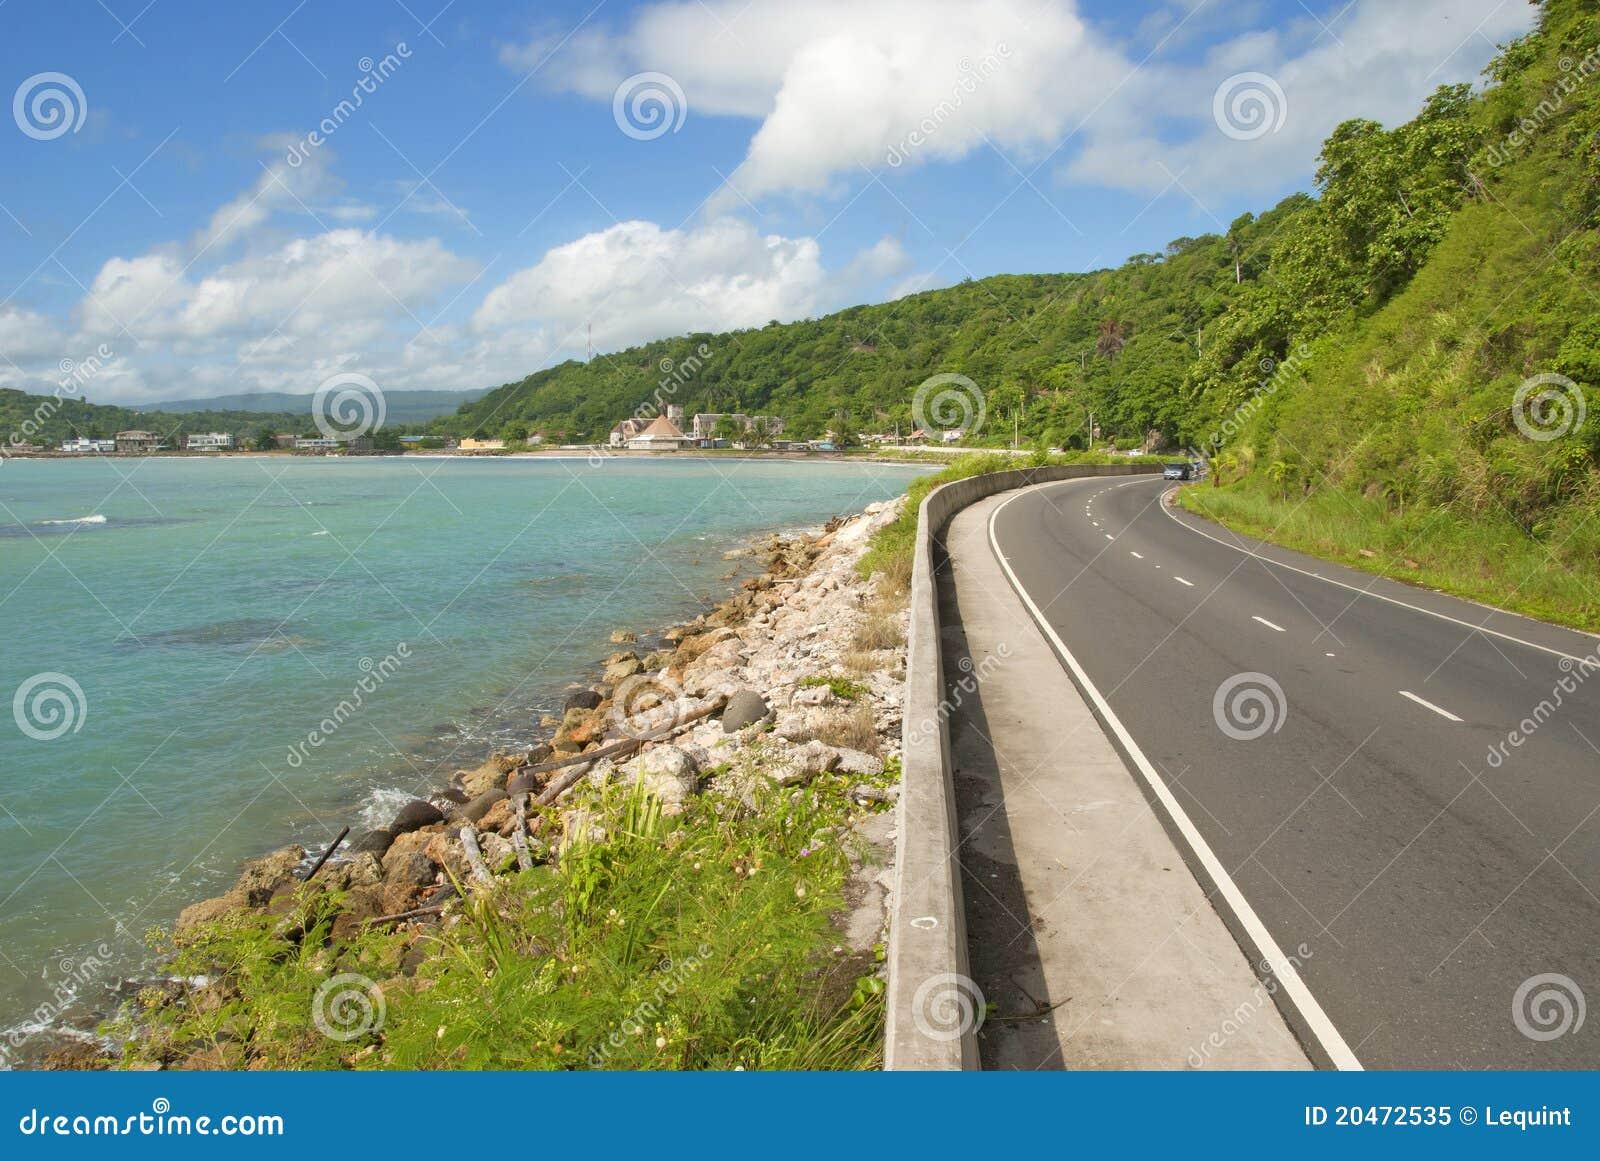 Mooie Caraïbische kustwegweg